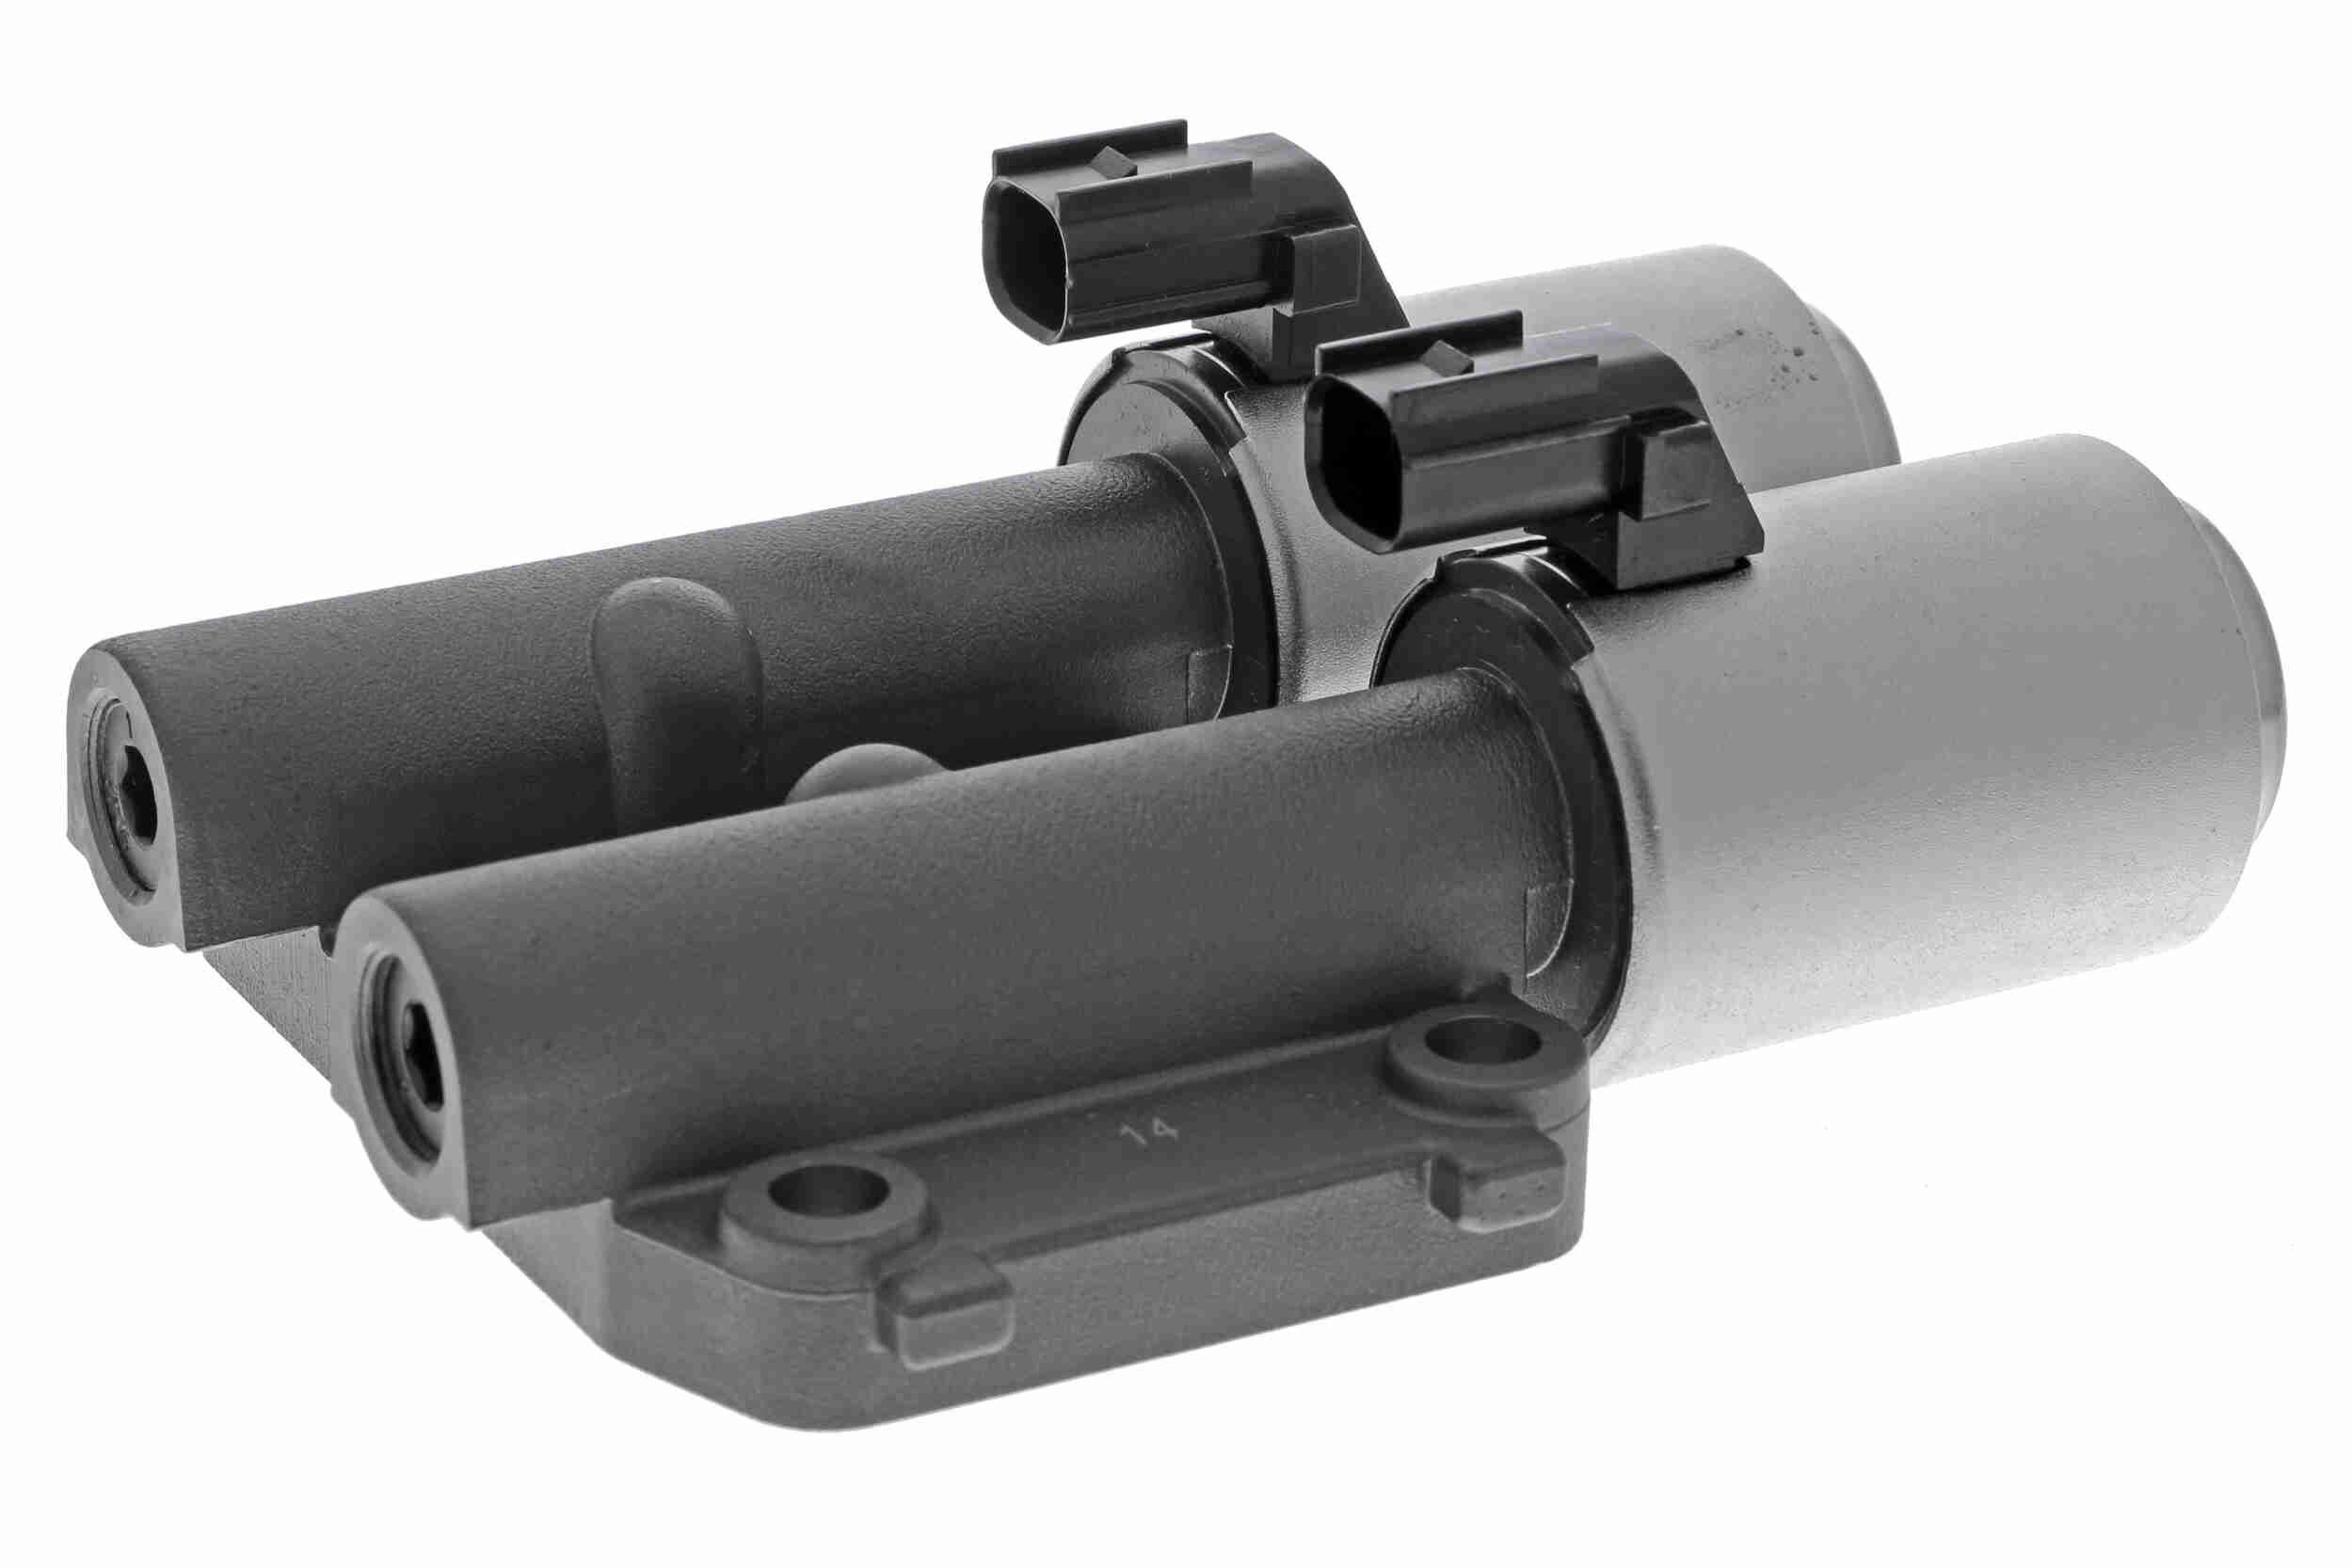 A26-77-0008 ACKOJA Schaltventil, Automatikgetriebe A26-77-0008 günstig kaufen